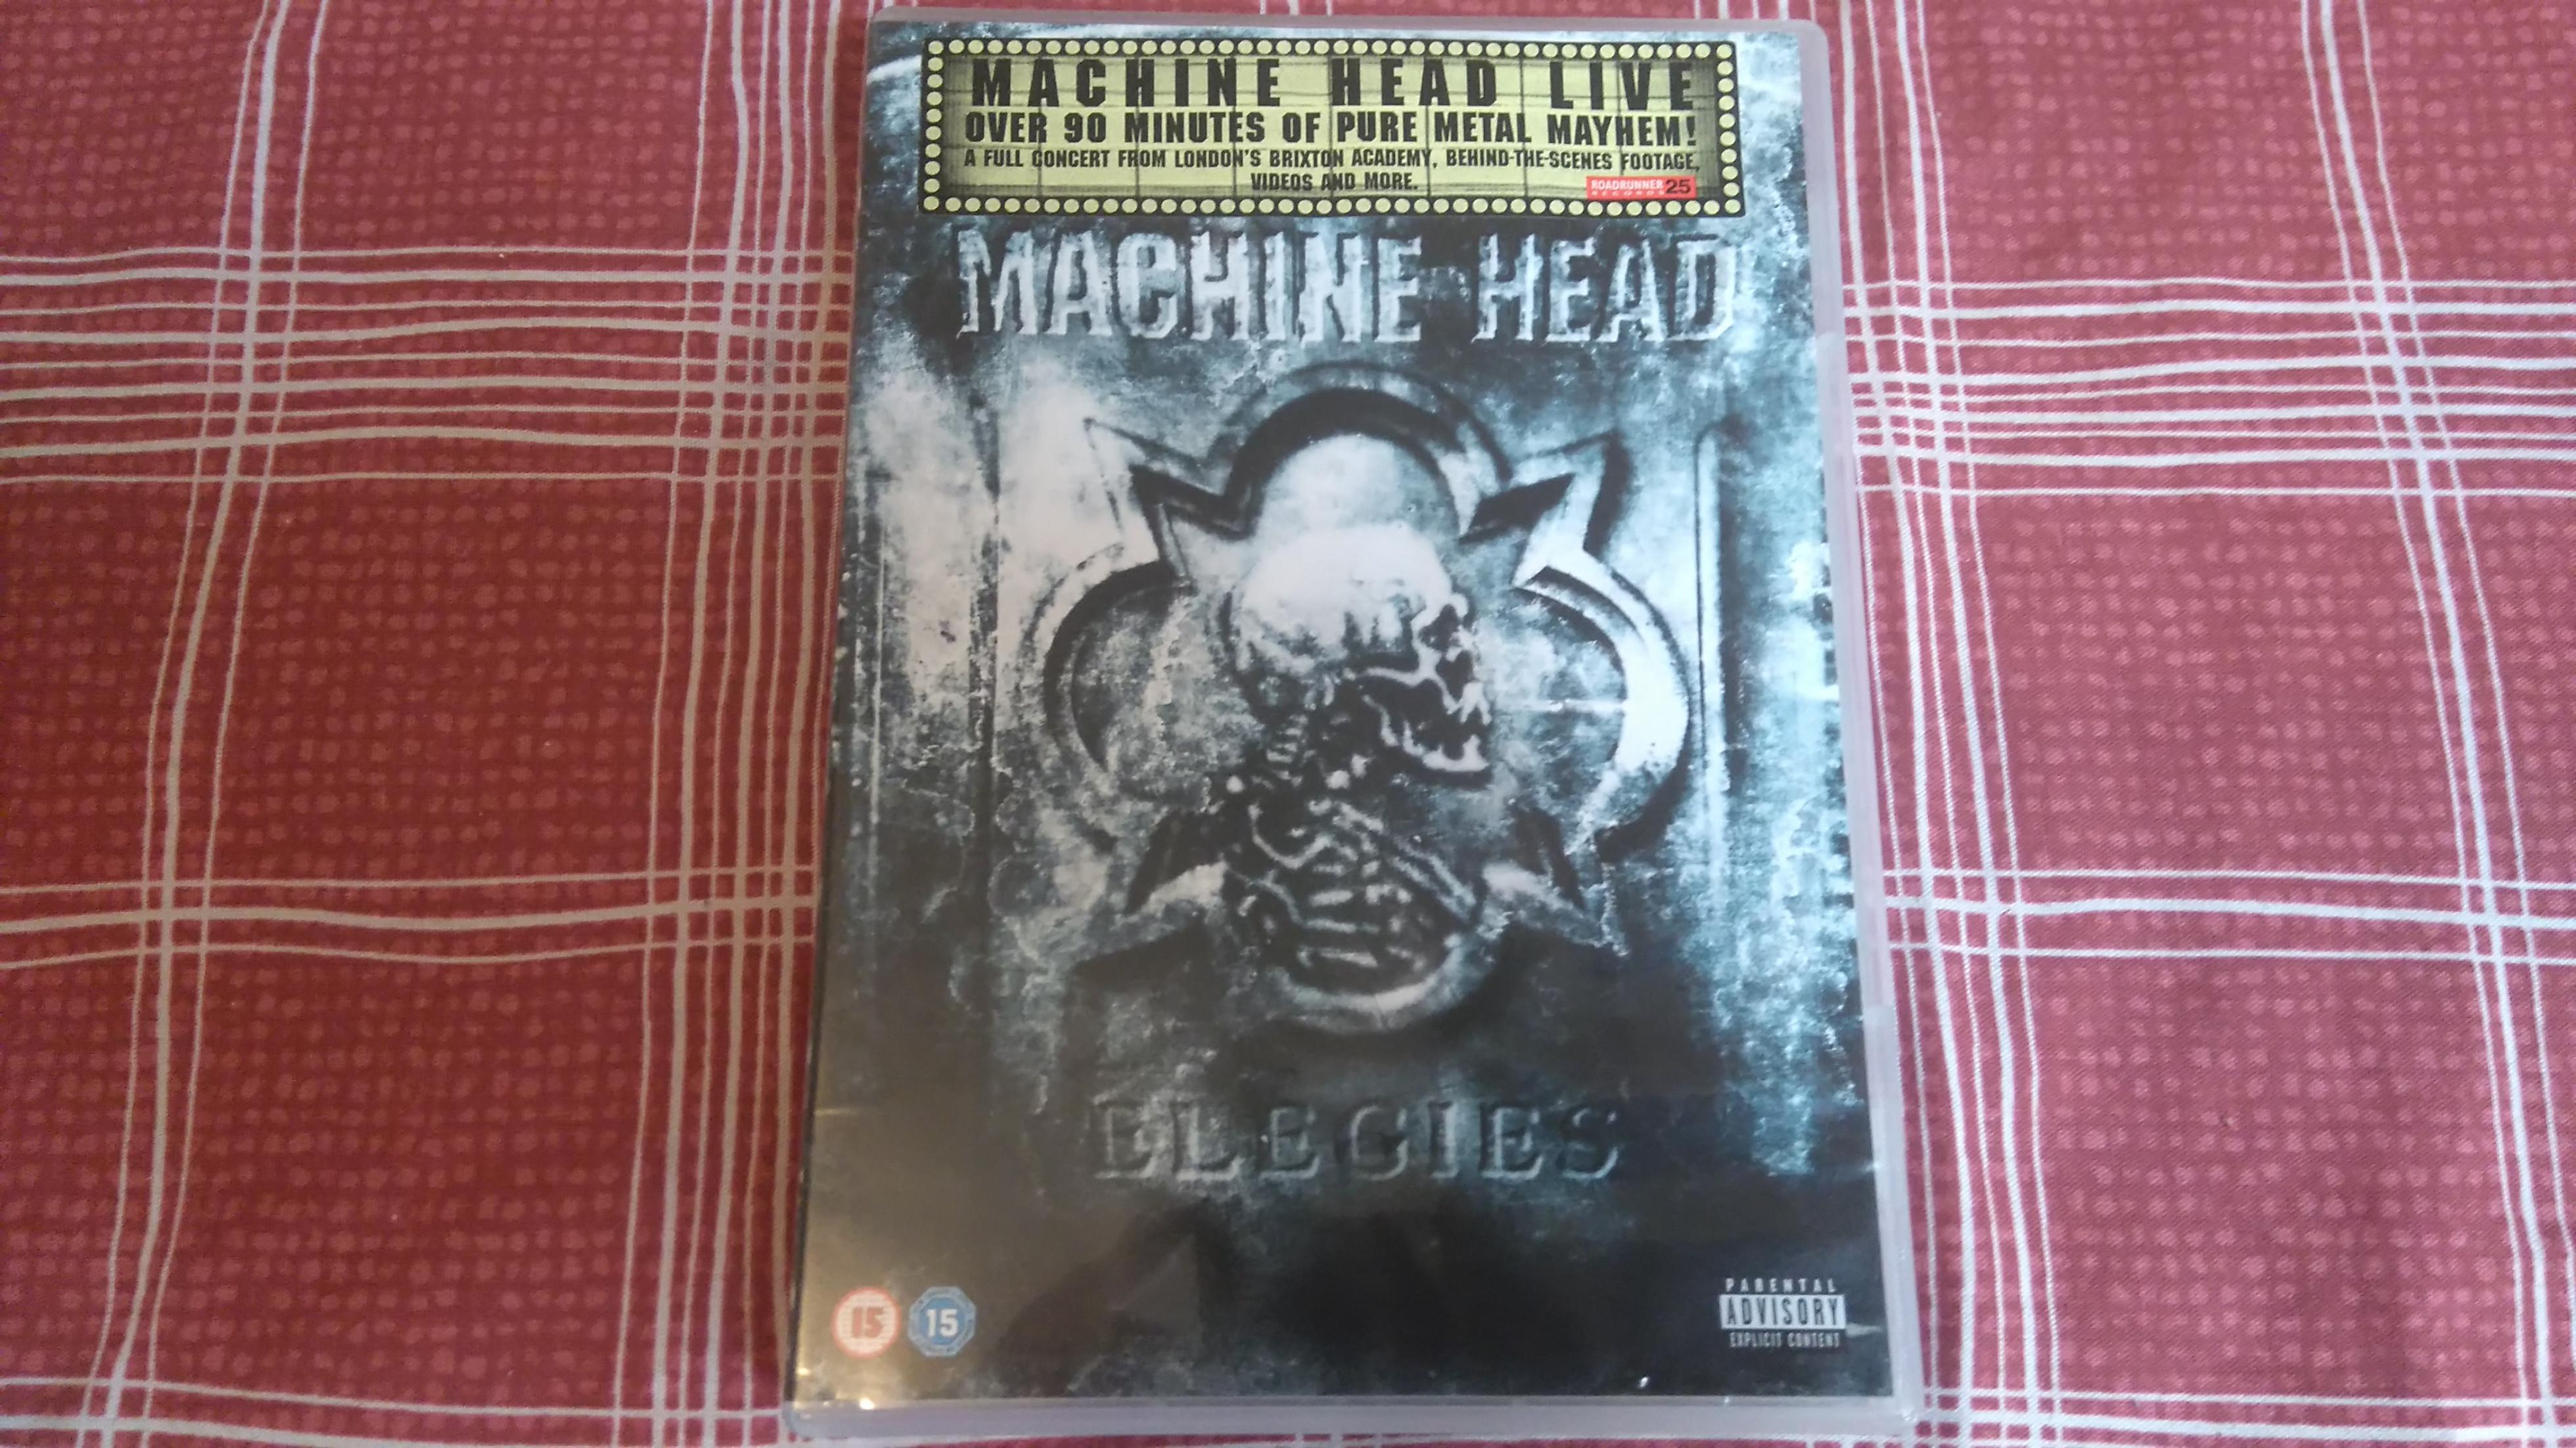 Machinehead DVD.JPG